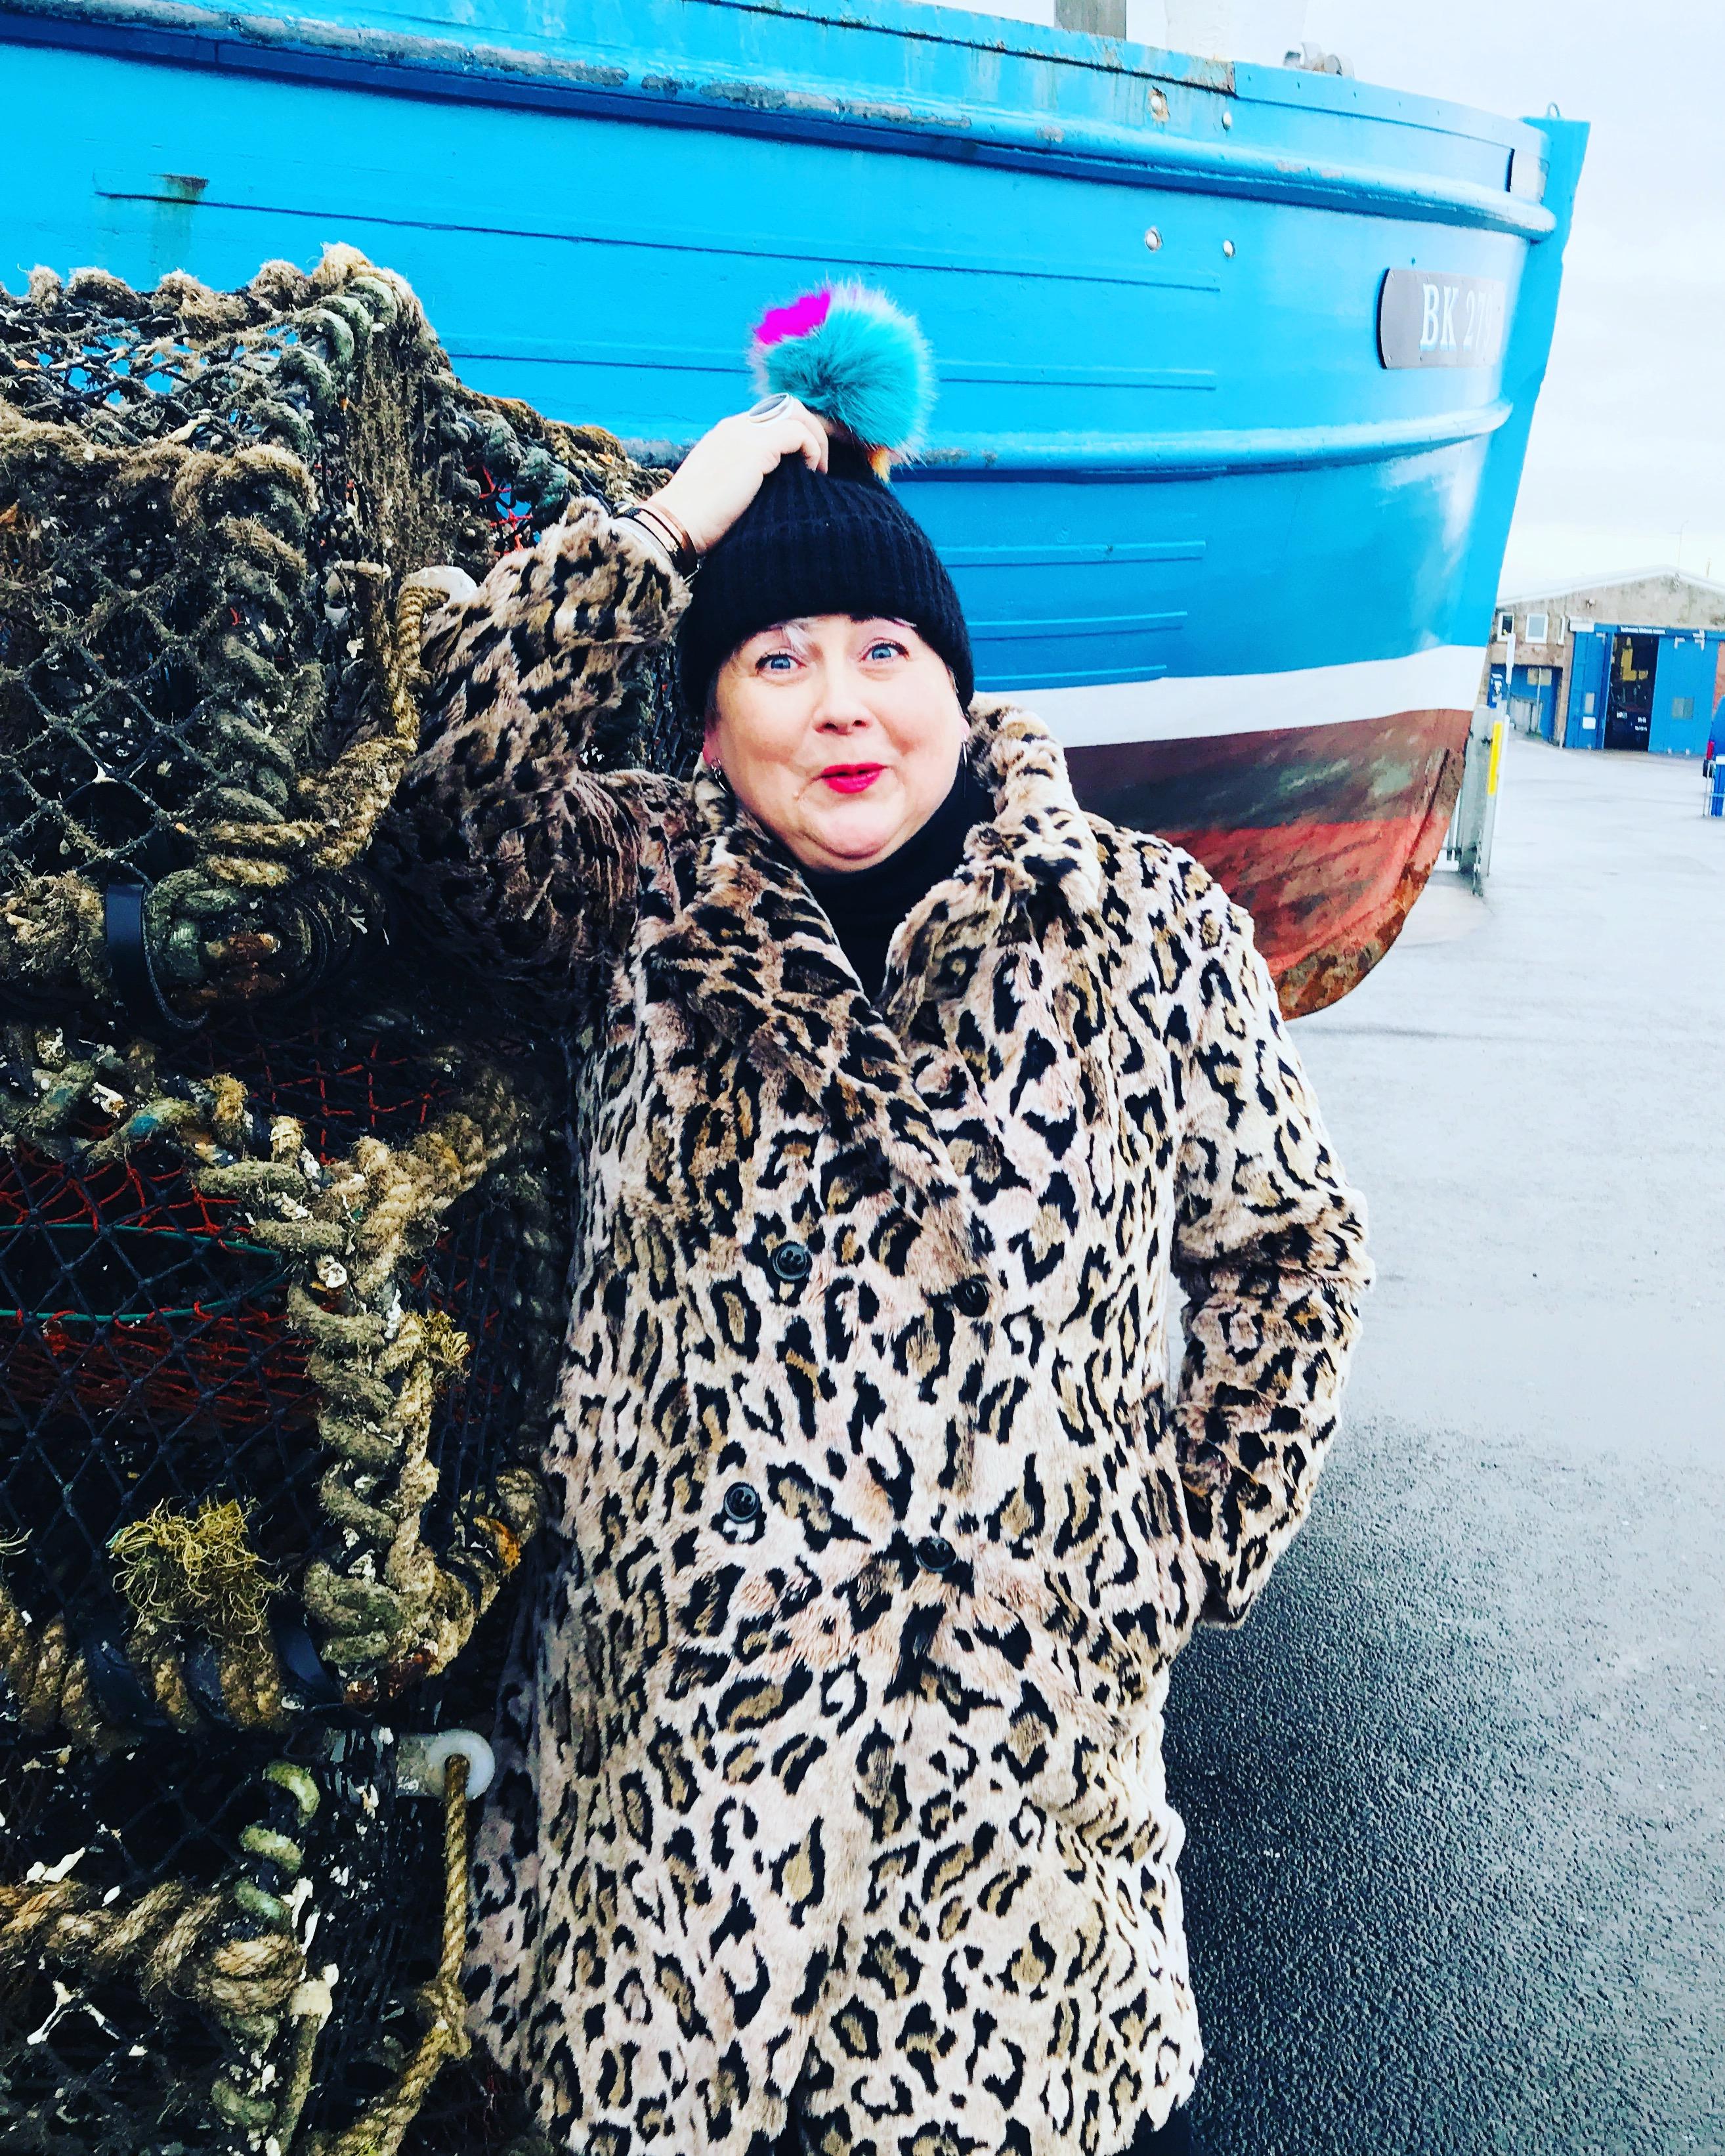 best-before-end-date-leopard-print-coat-winter-2017